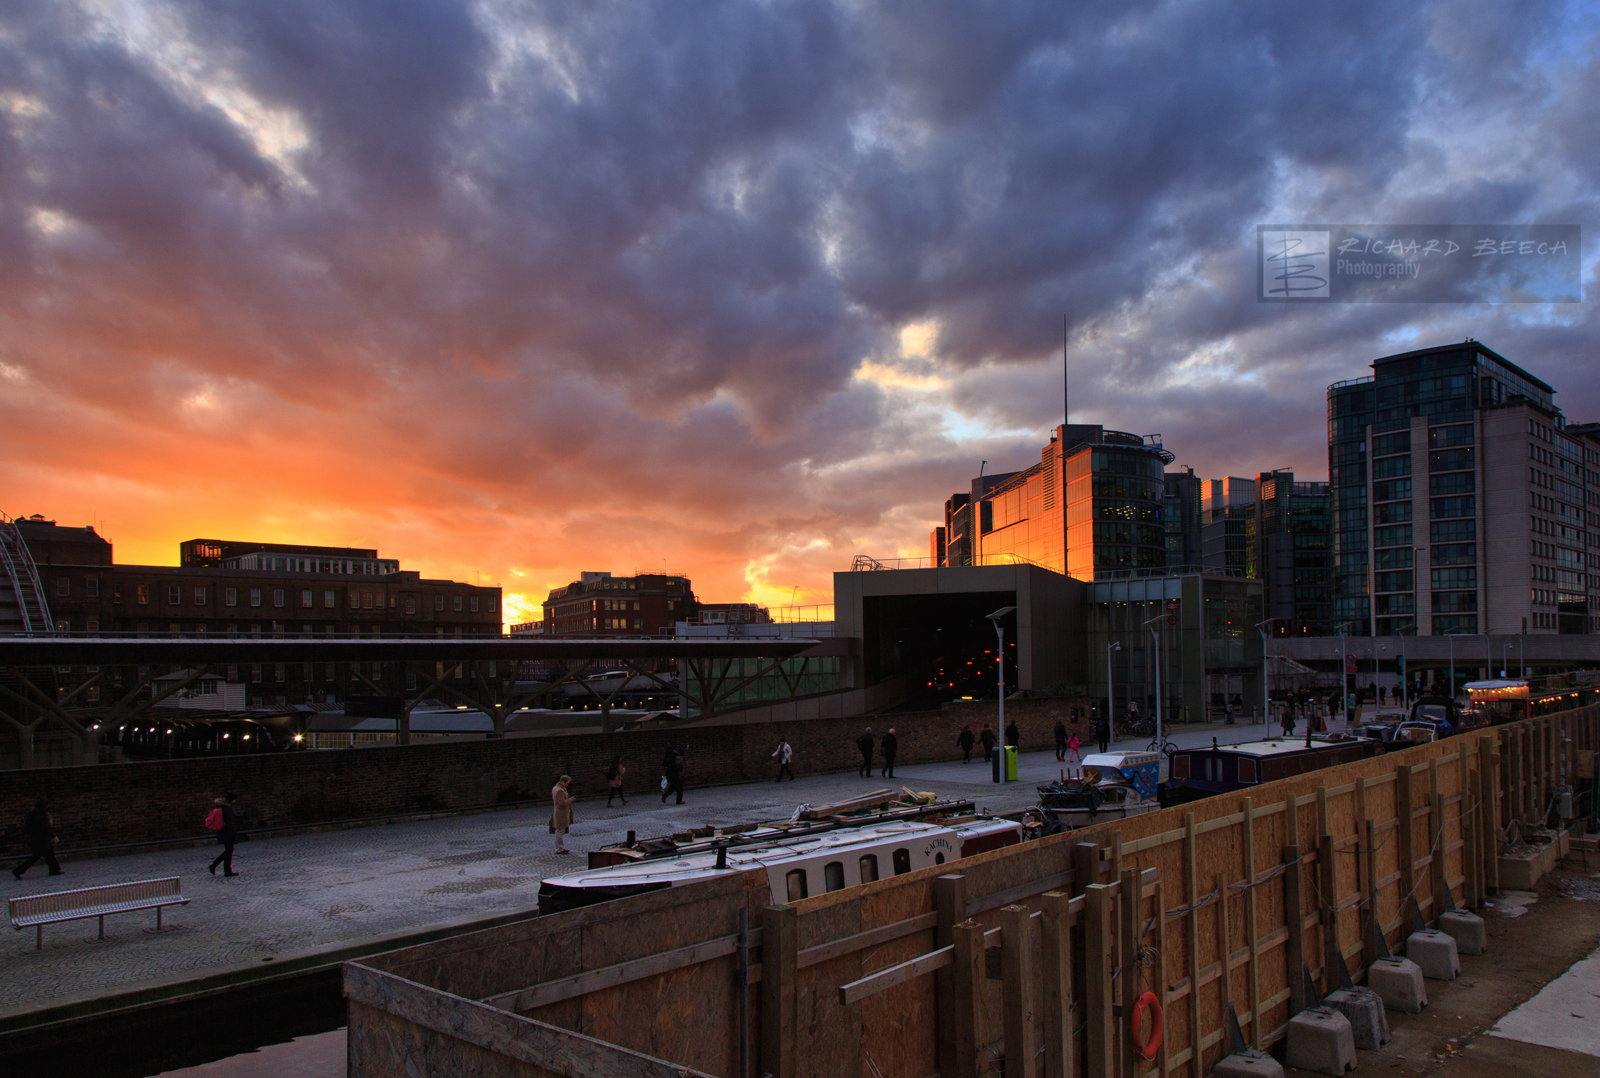 Paddington Station Sunset